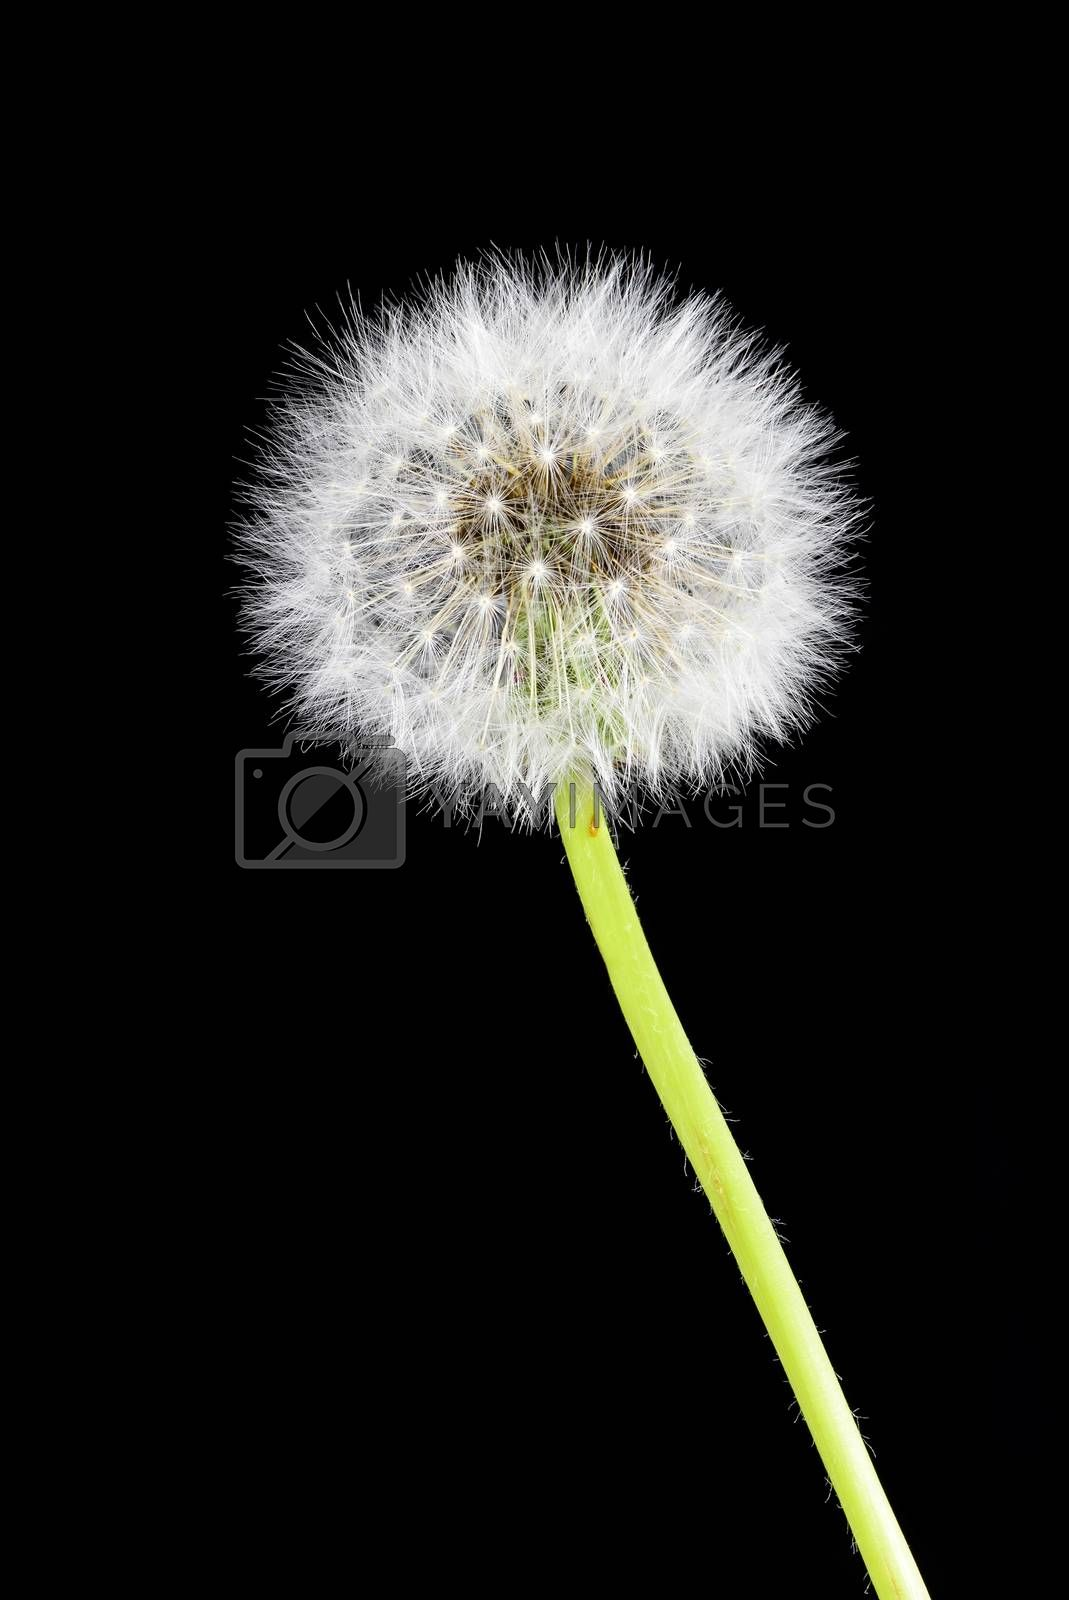 Seed head of dandelion flower on black background